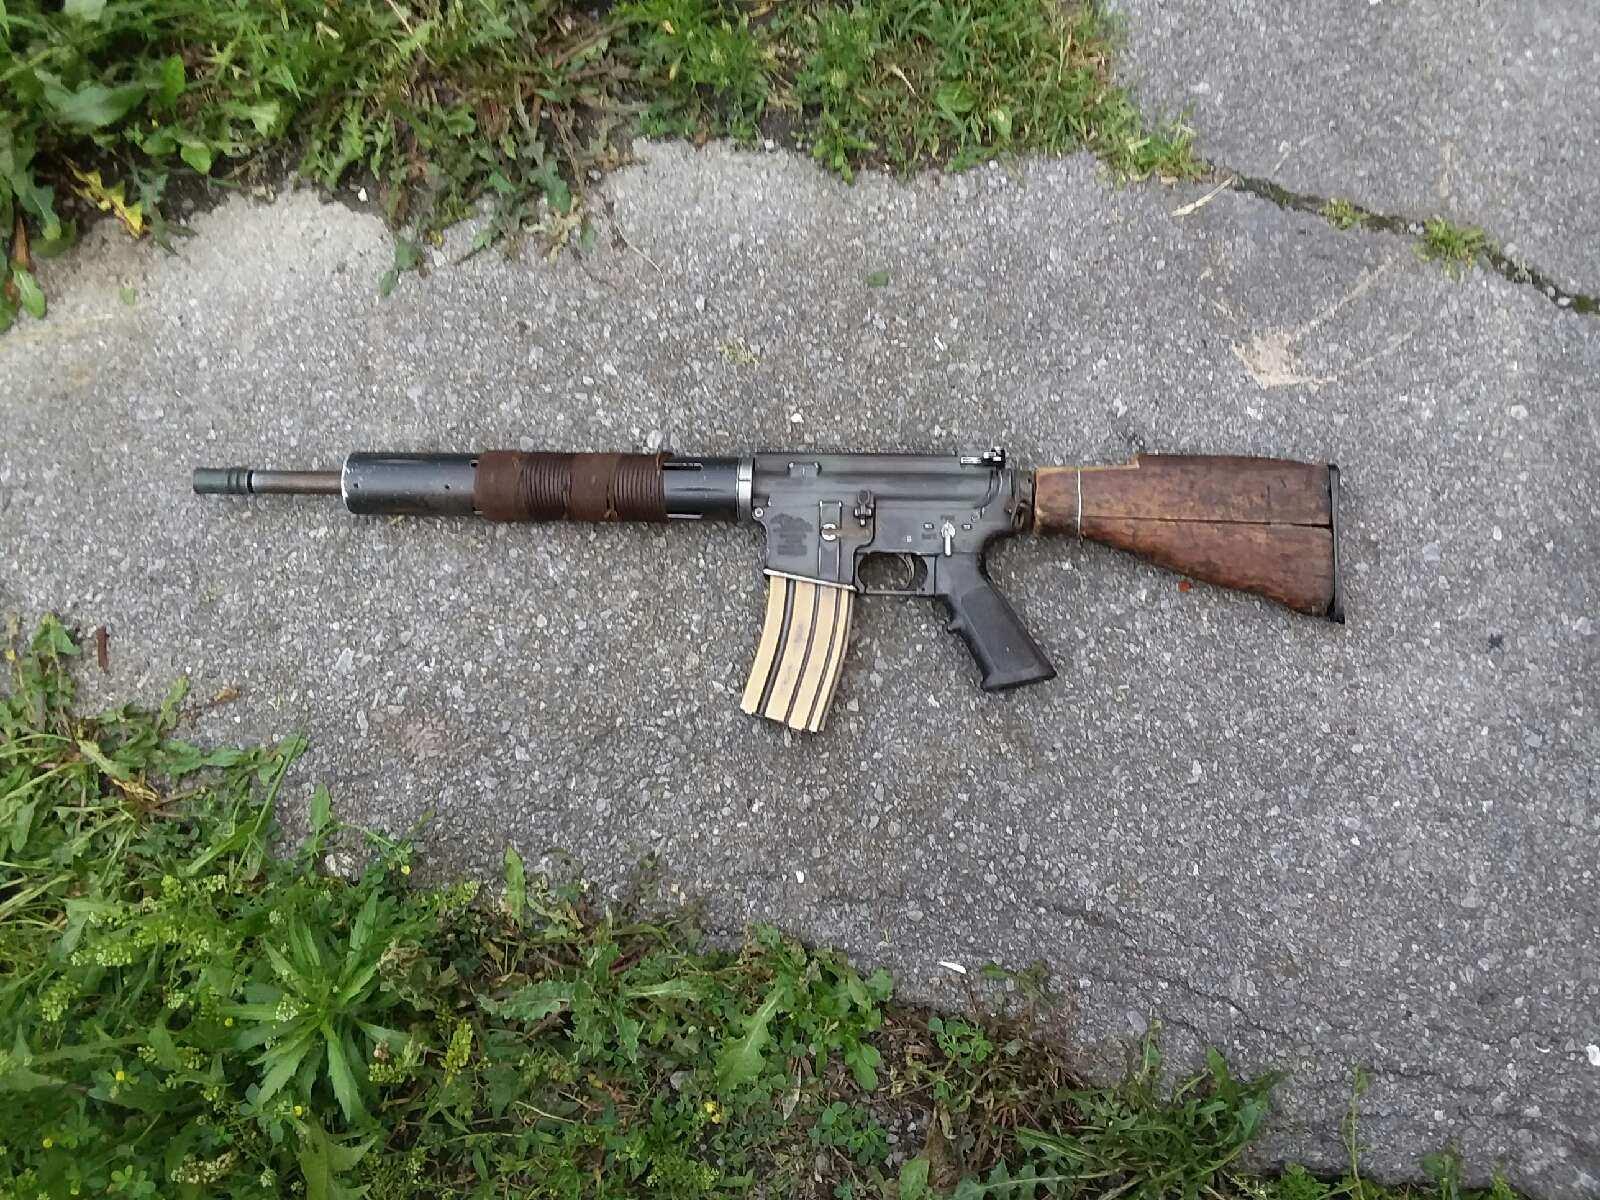 post apocalyptic style custom rifle builds mauser AR-15 5